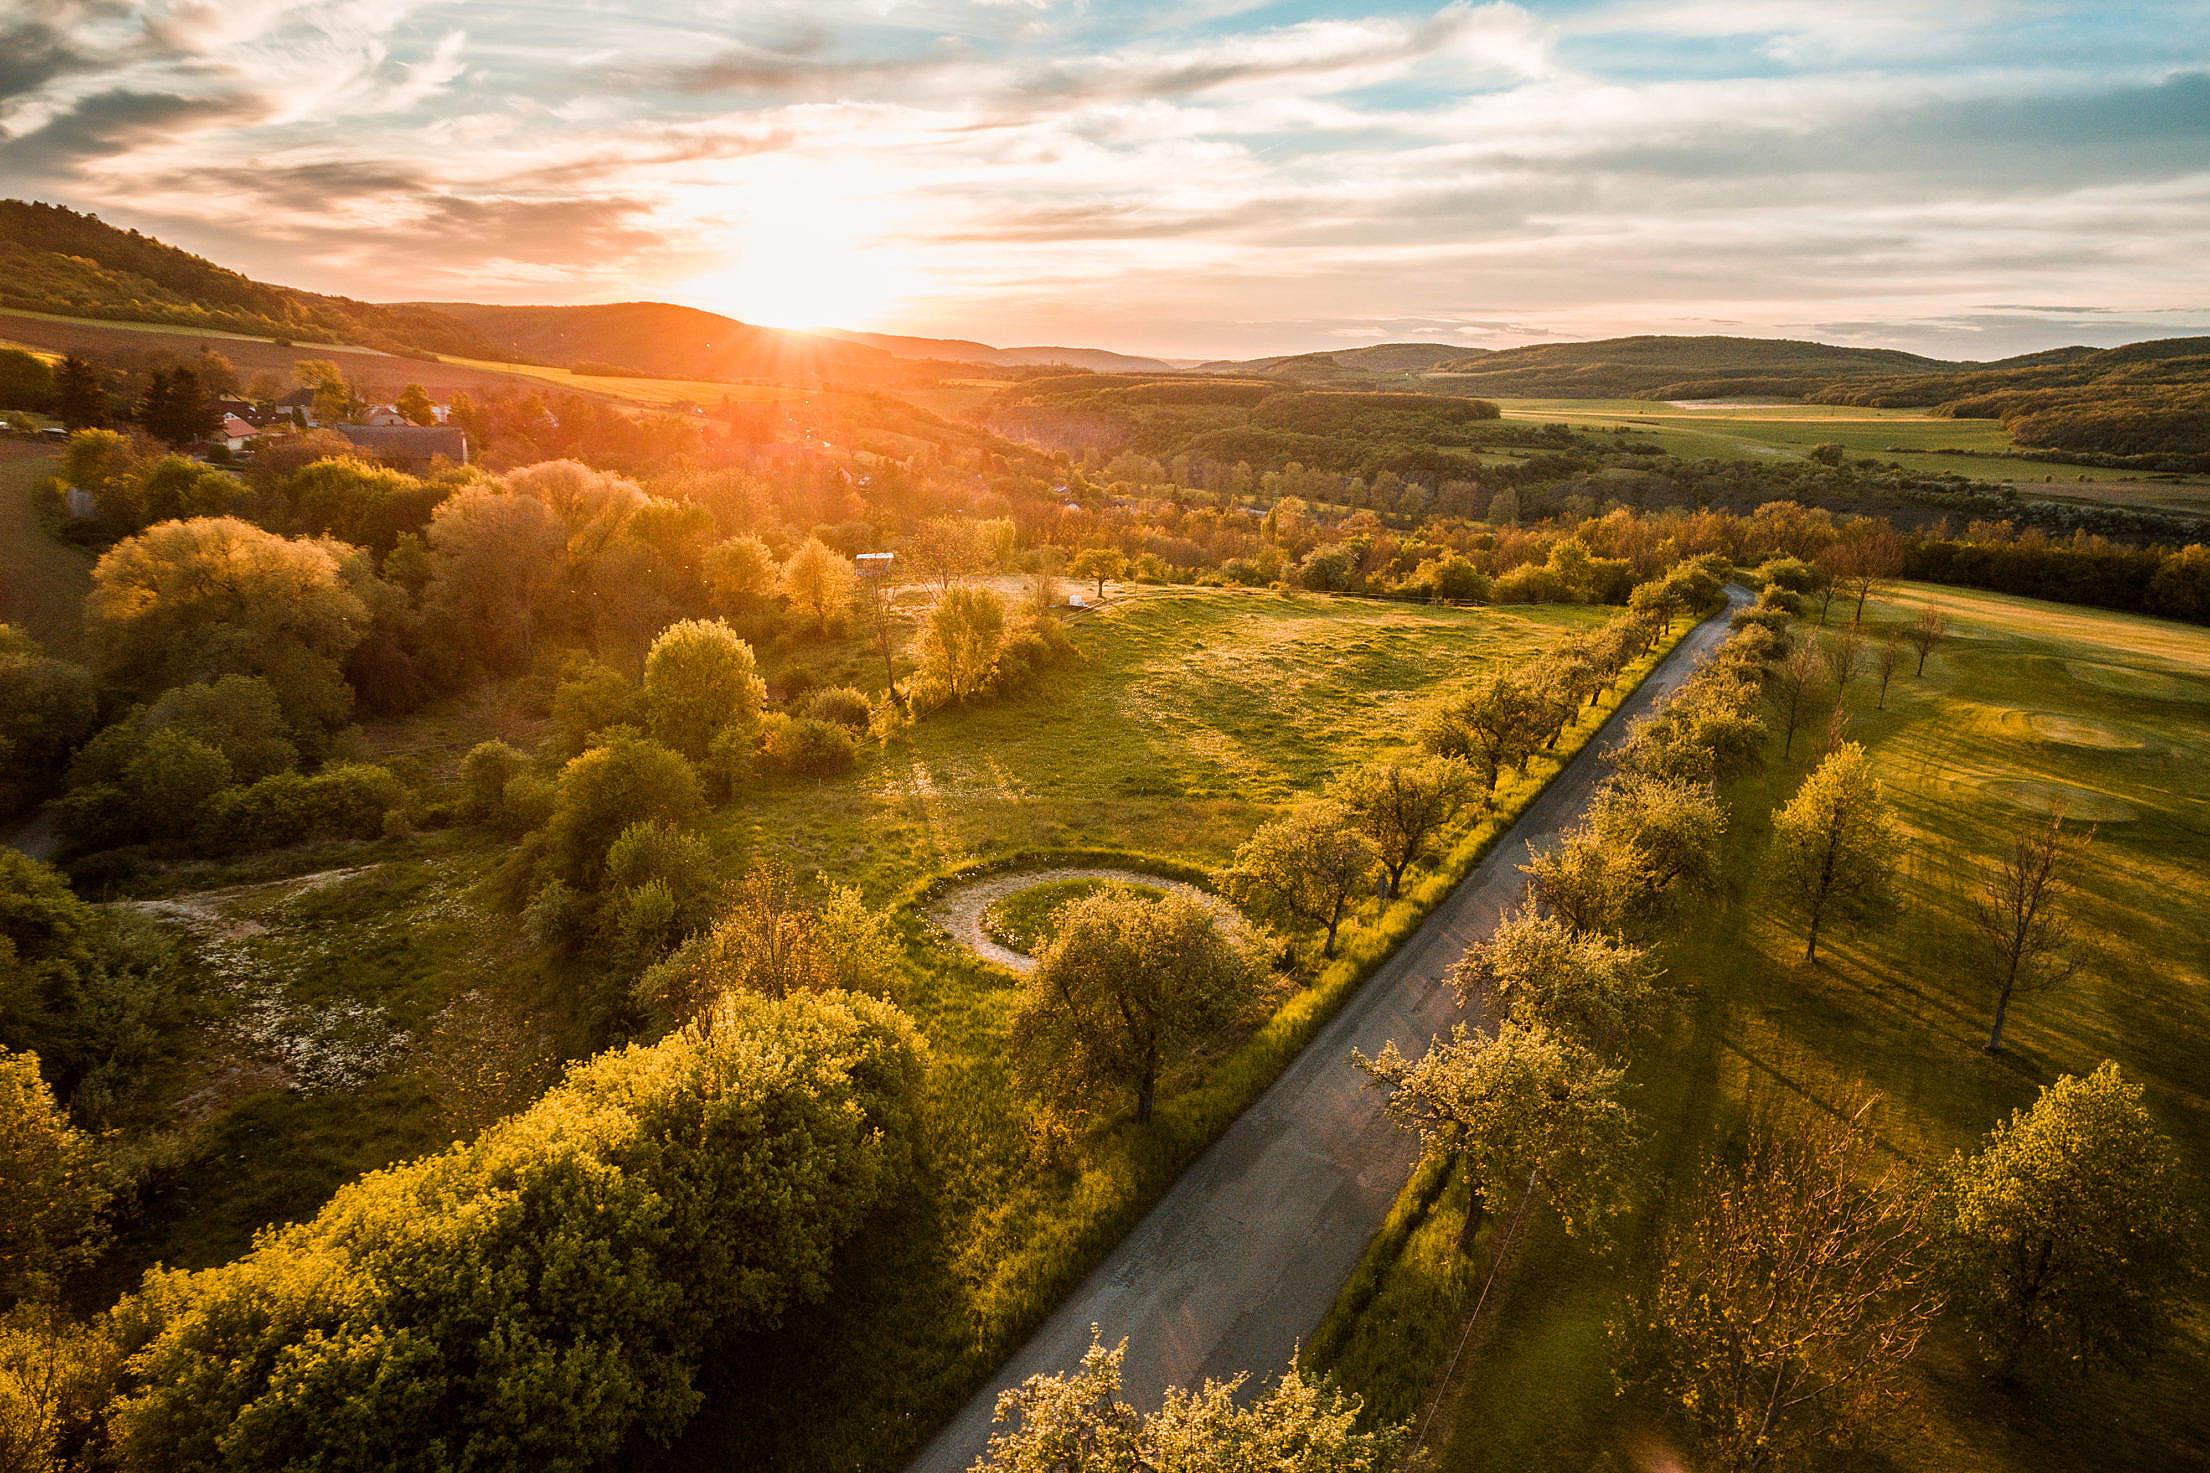 Beautiful Sunset Over Hills #2 Free Stock Photo